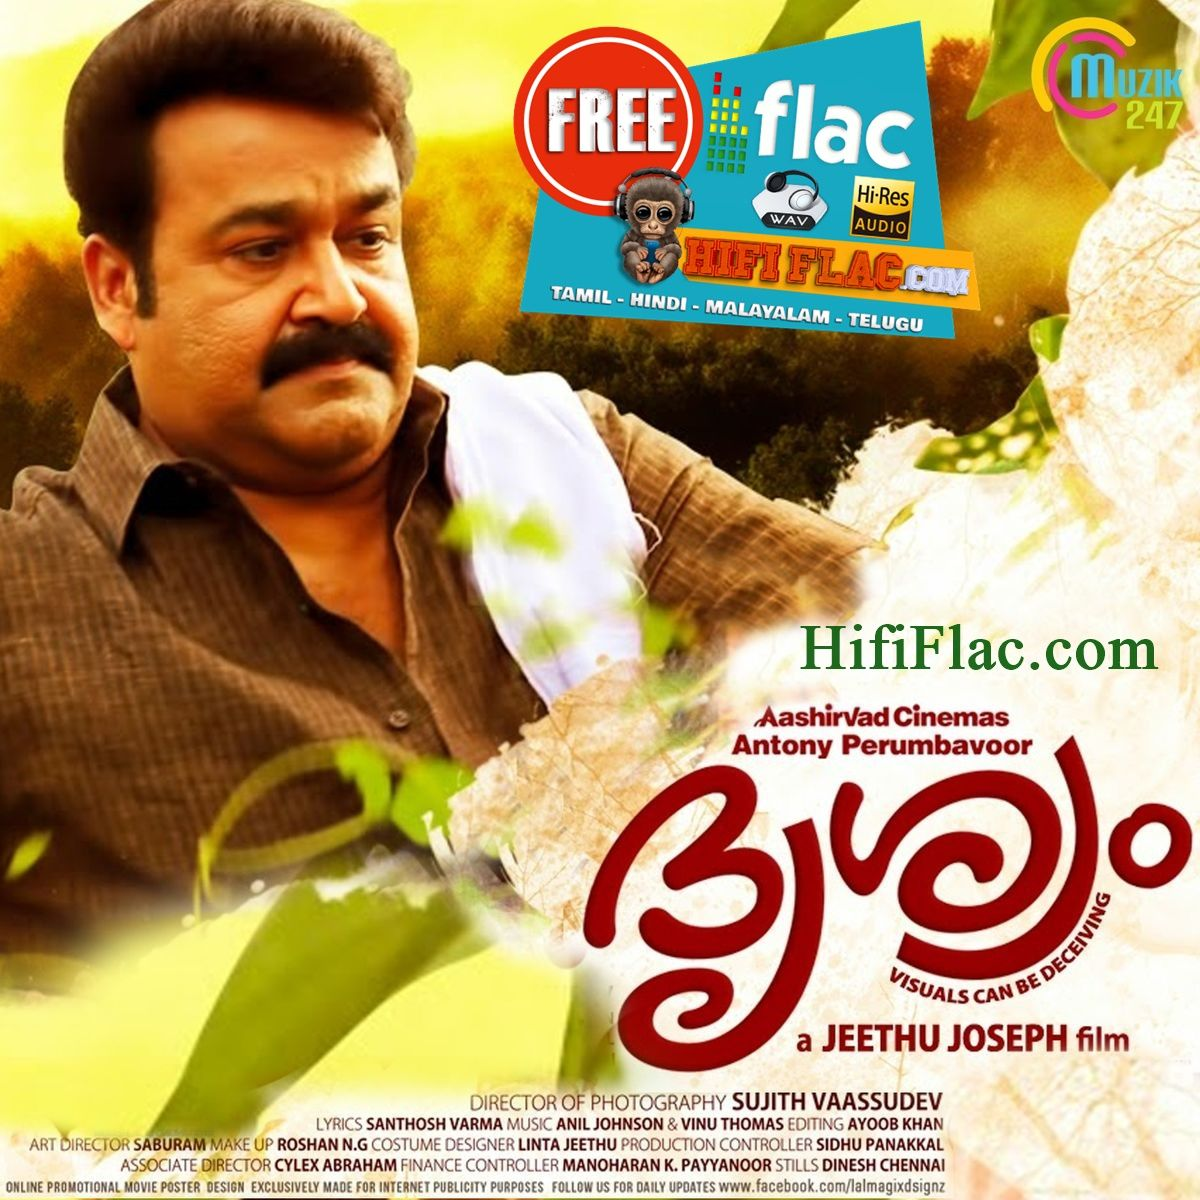 Drishyam 2013-Malayalam-Digitalrip-Flac  Jeethu Joseph -7614